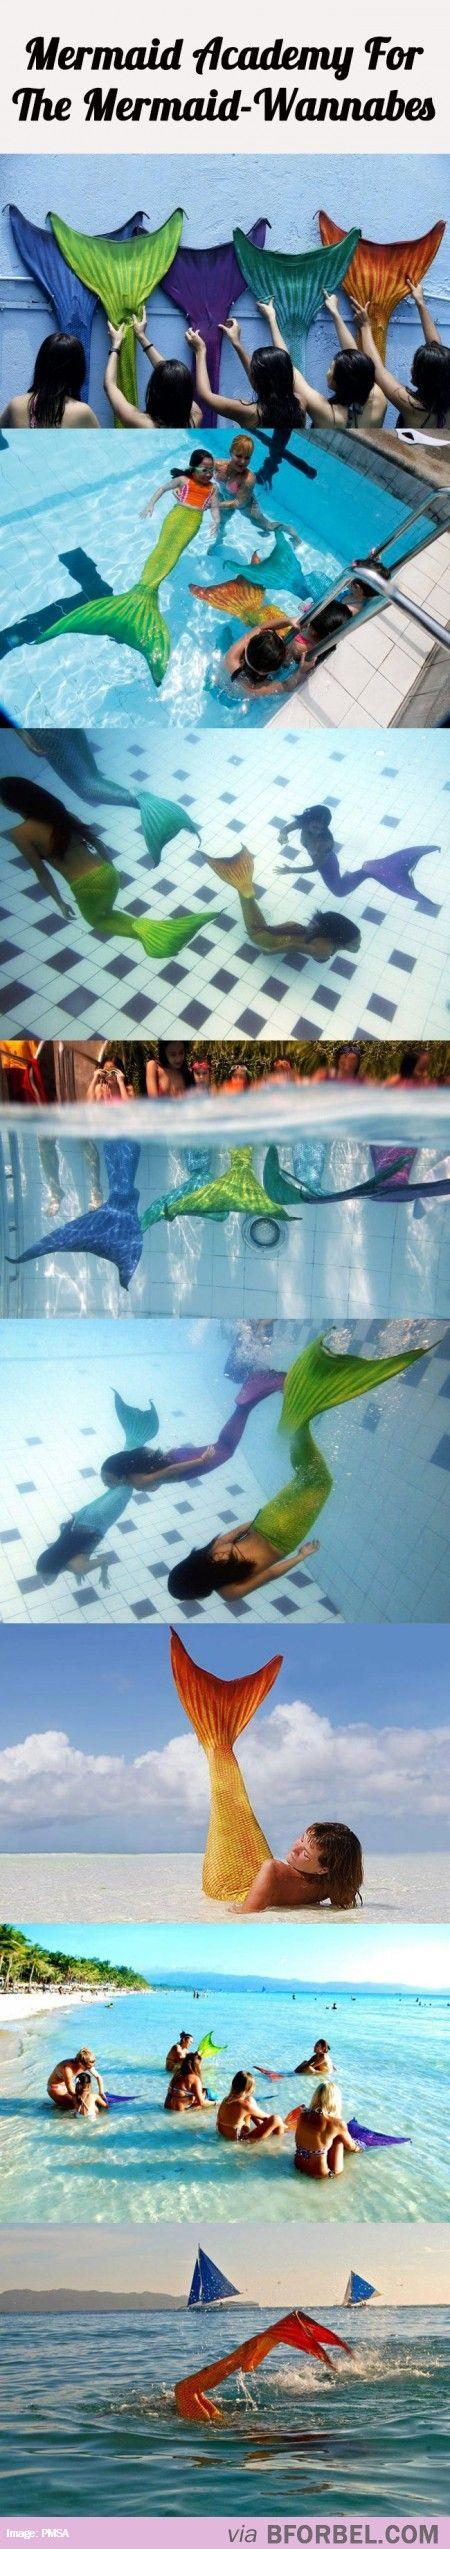 Mermaid Academy. I'm in!